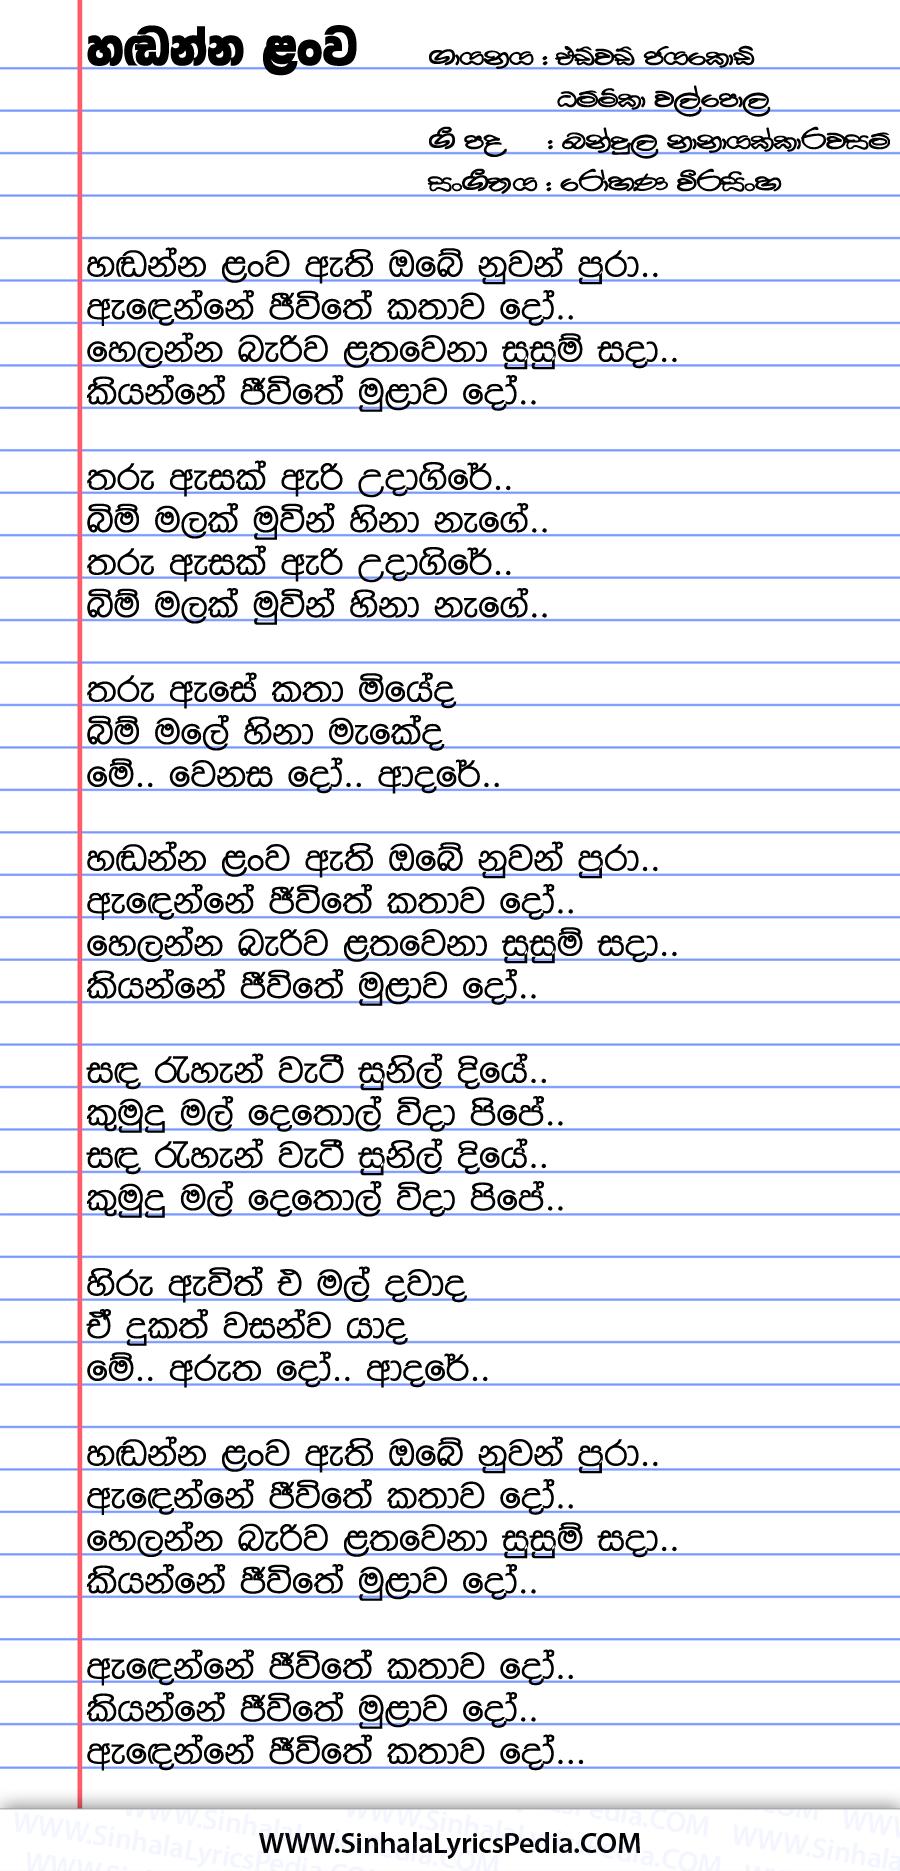 Hadanna Lanwa Athi Obe Nuwan Pura Song Lyrics